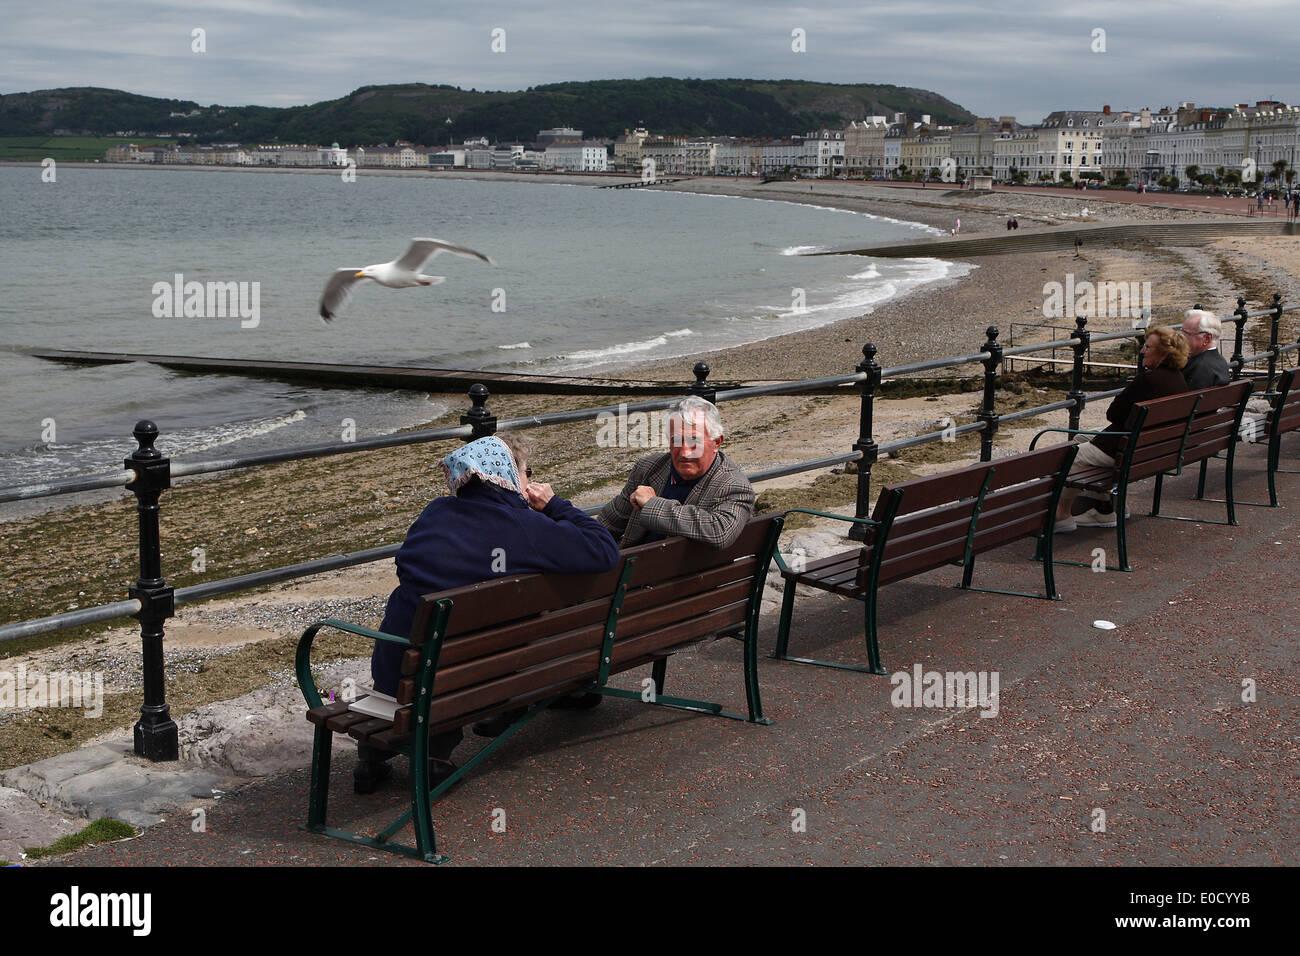 Benches on the promenade of seaside resort Llandudno, North Wales, Great Britain, Europe - Stock Image